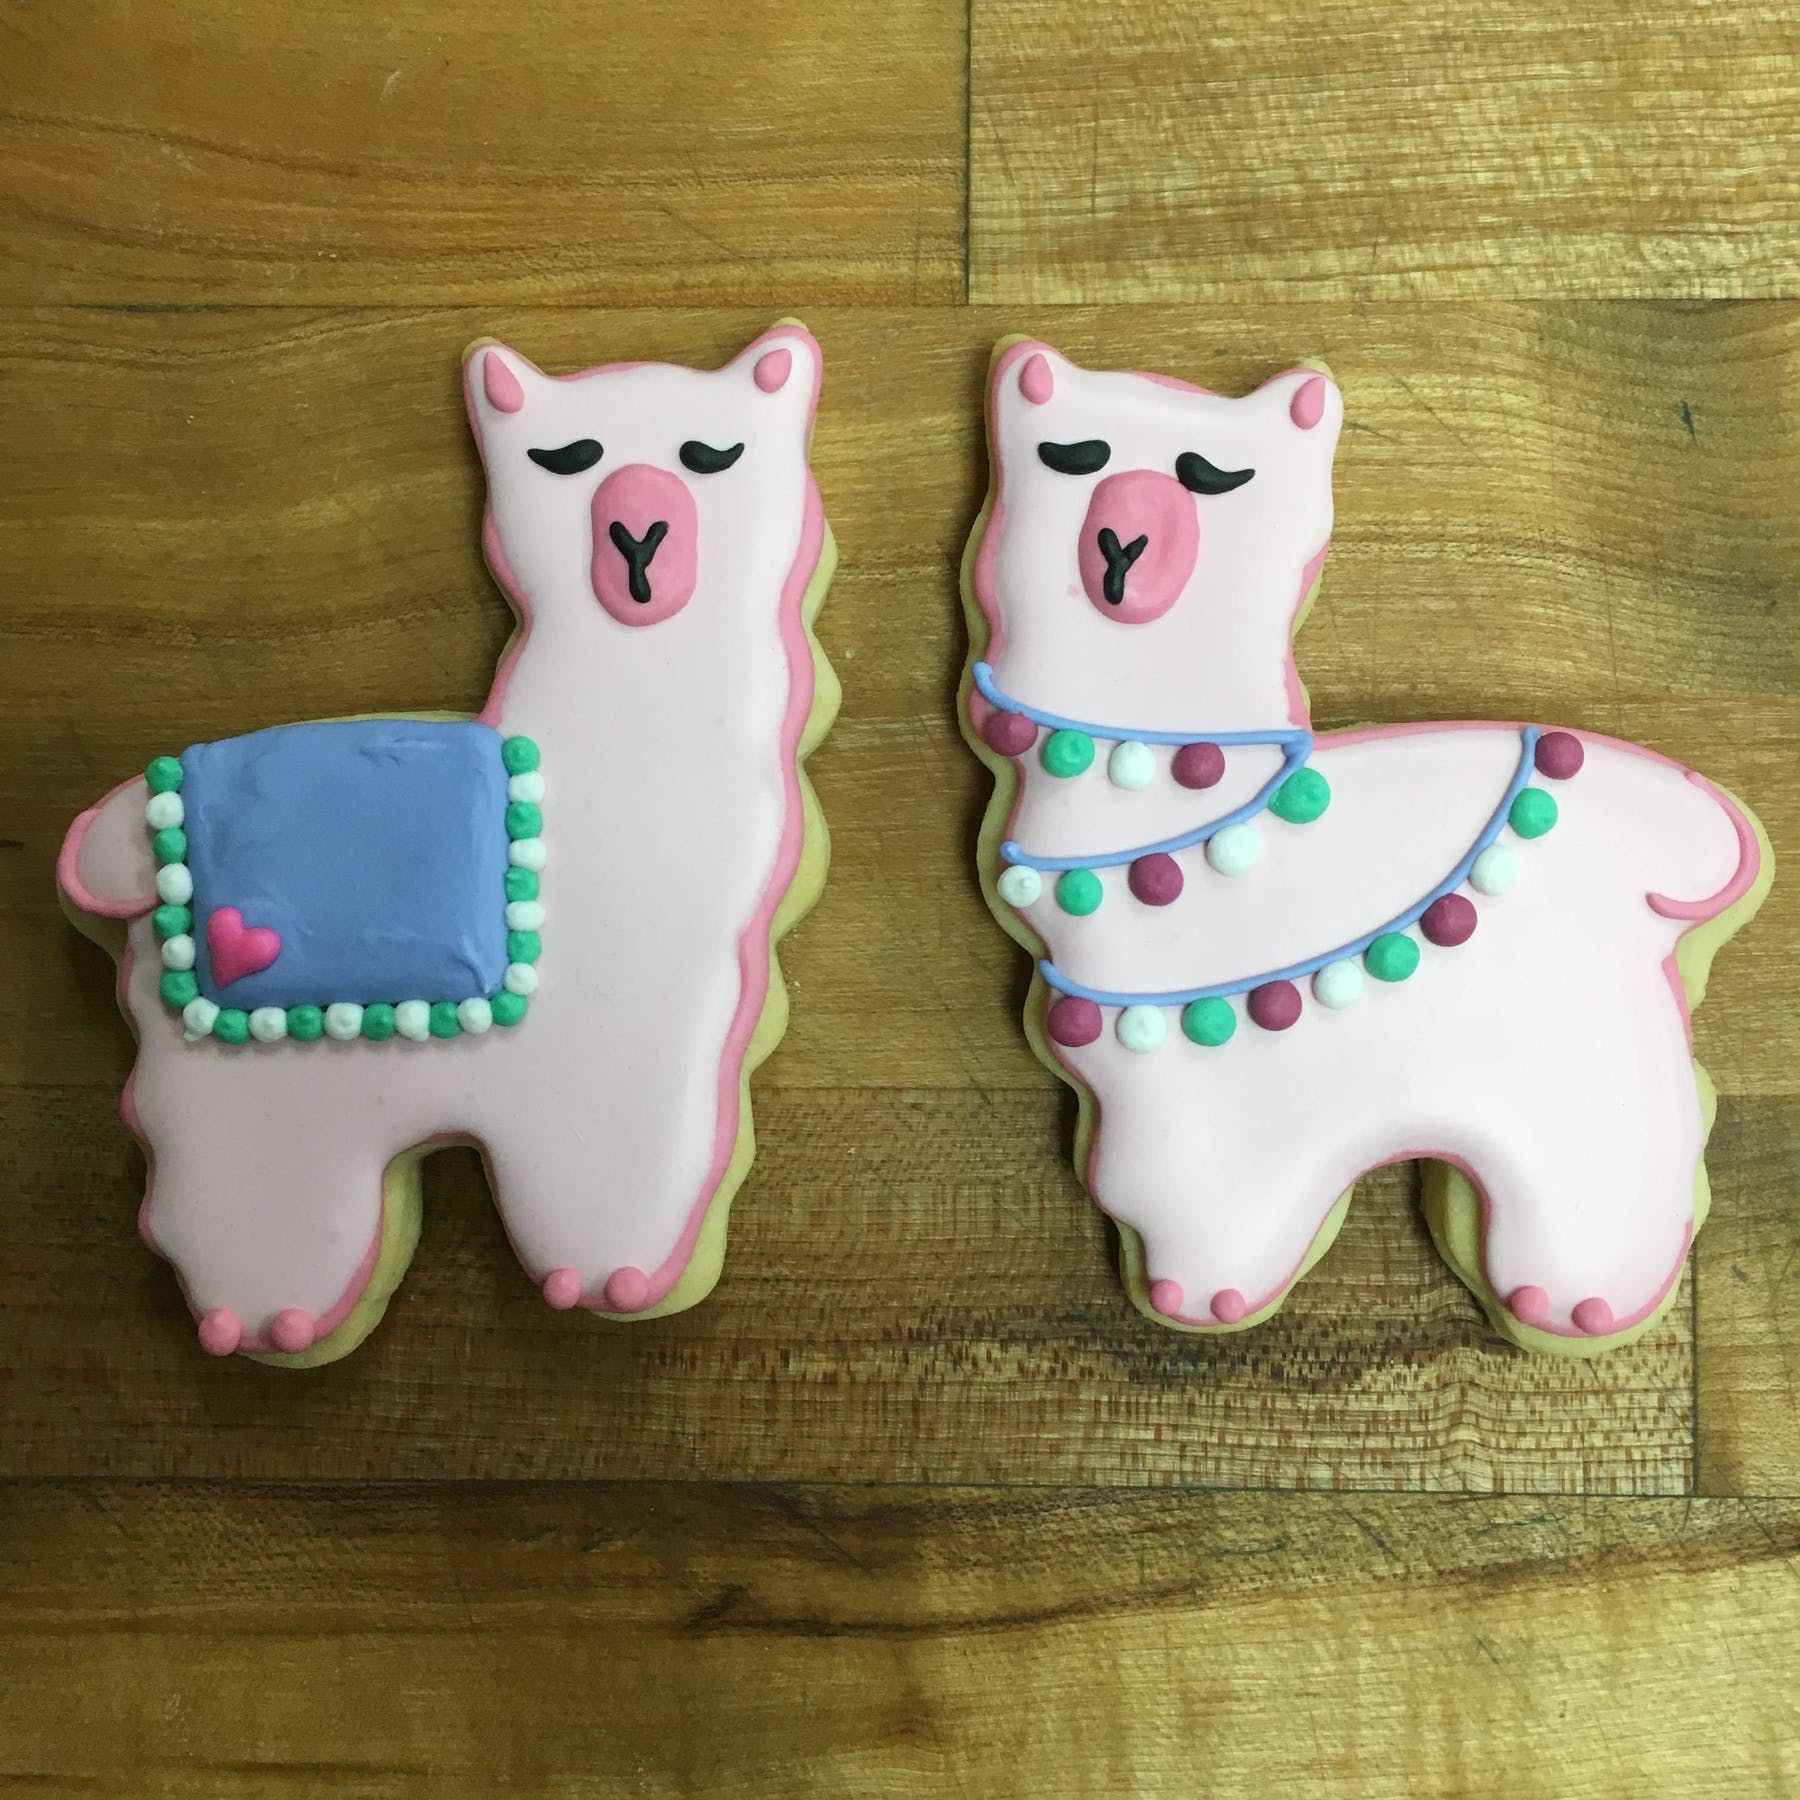 llama-shaped cookies